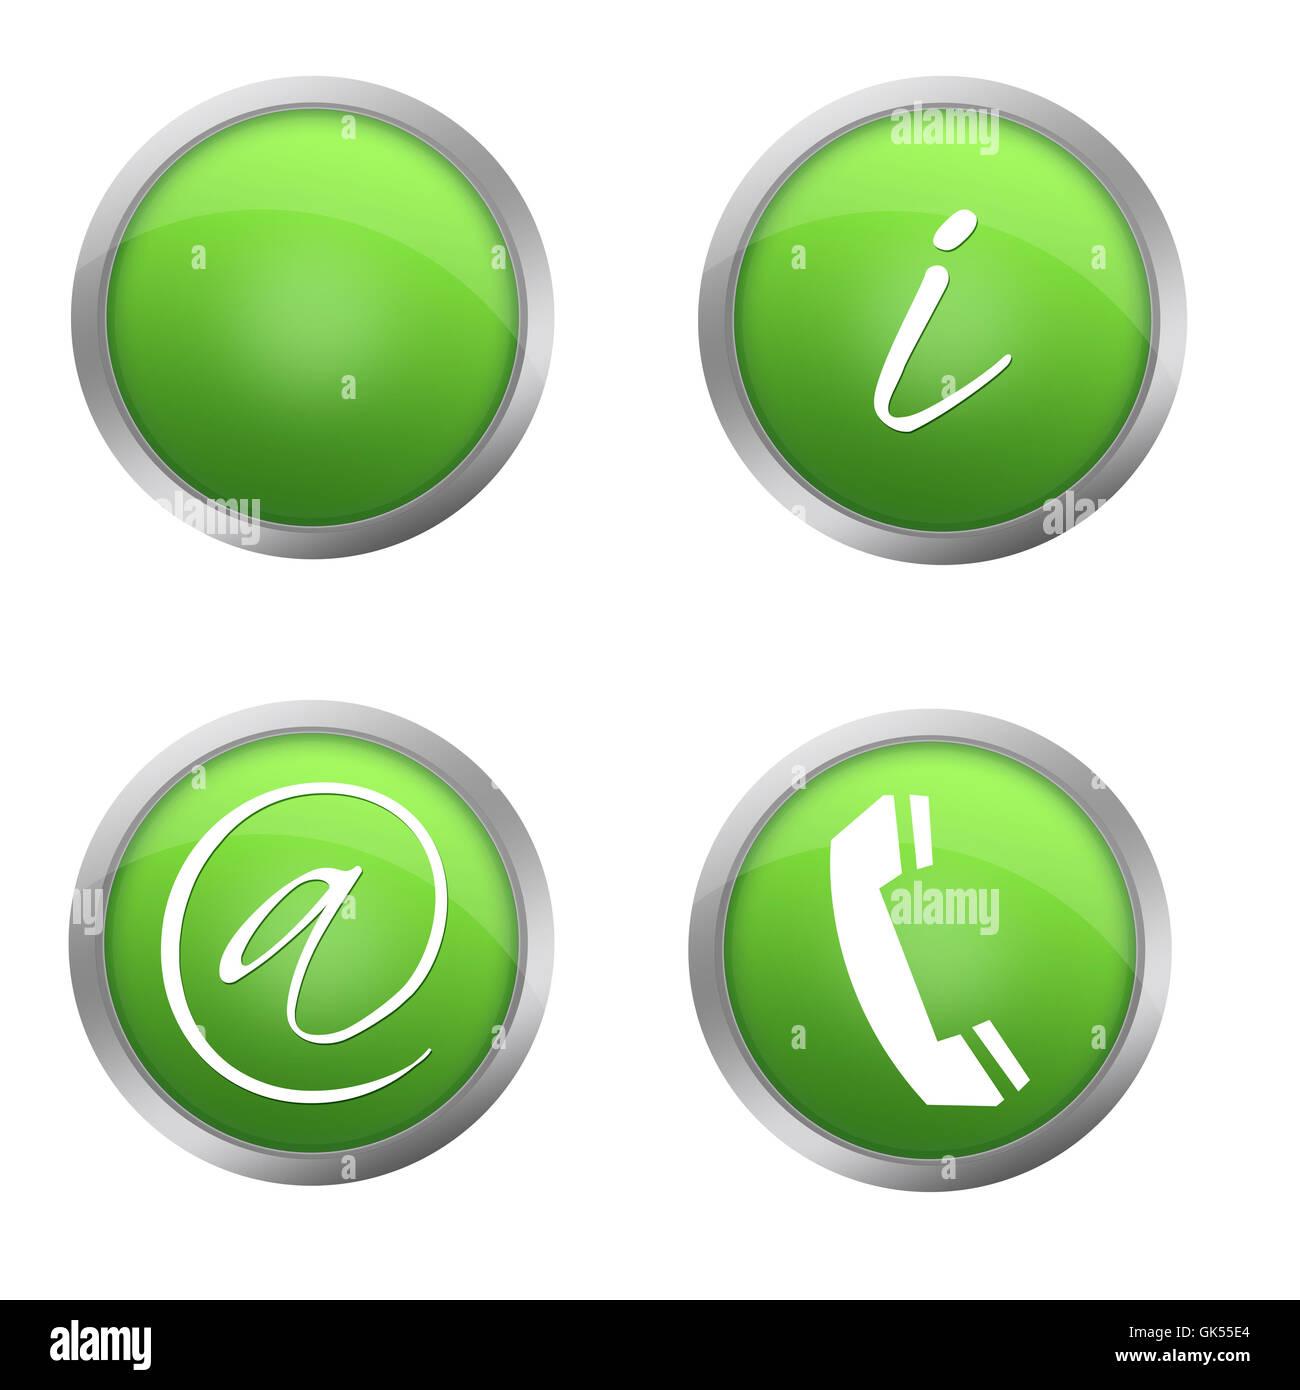 green brilliance call - Stock Image